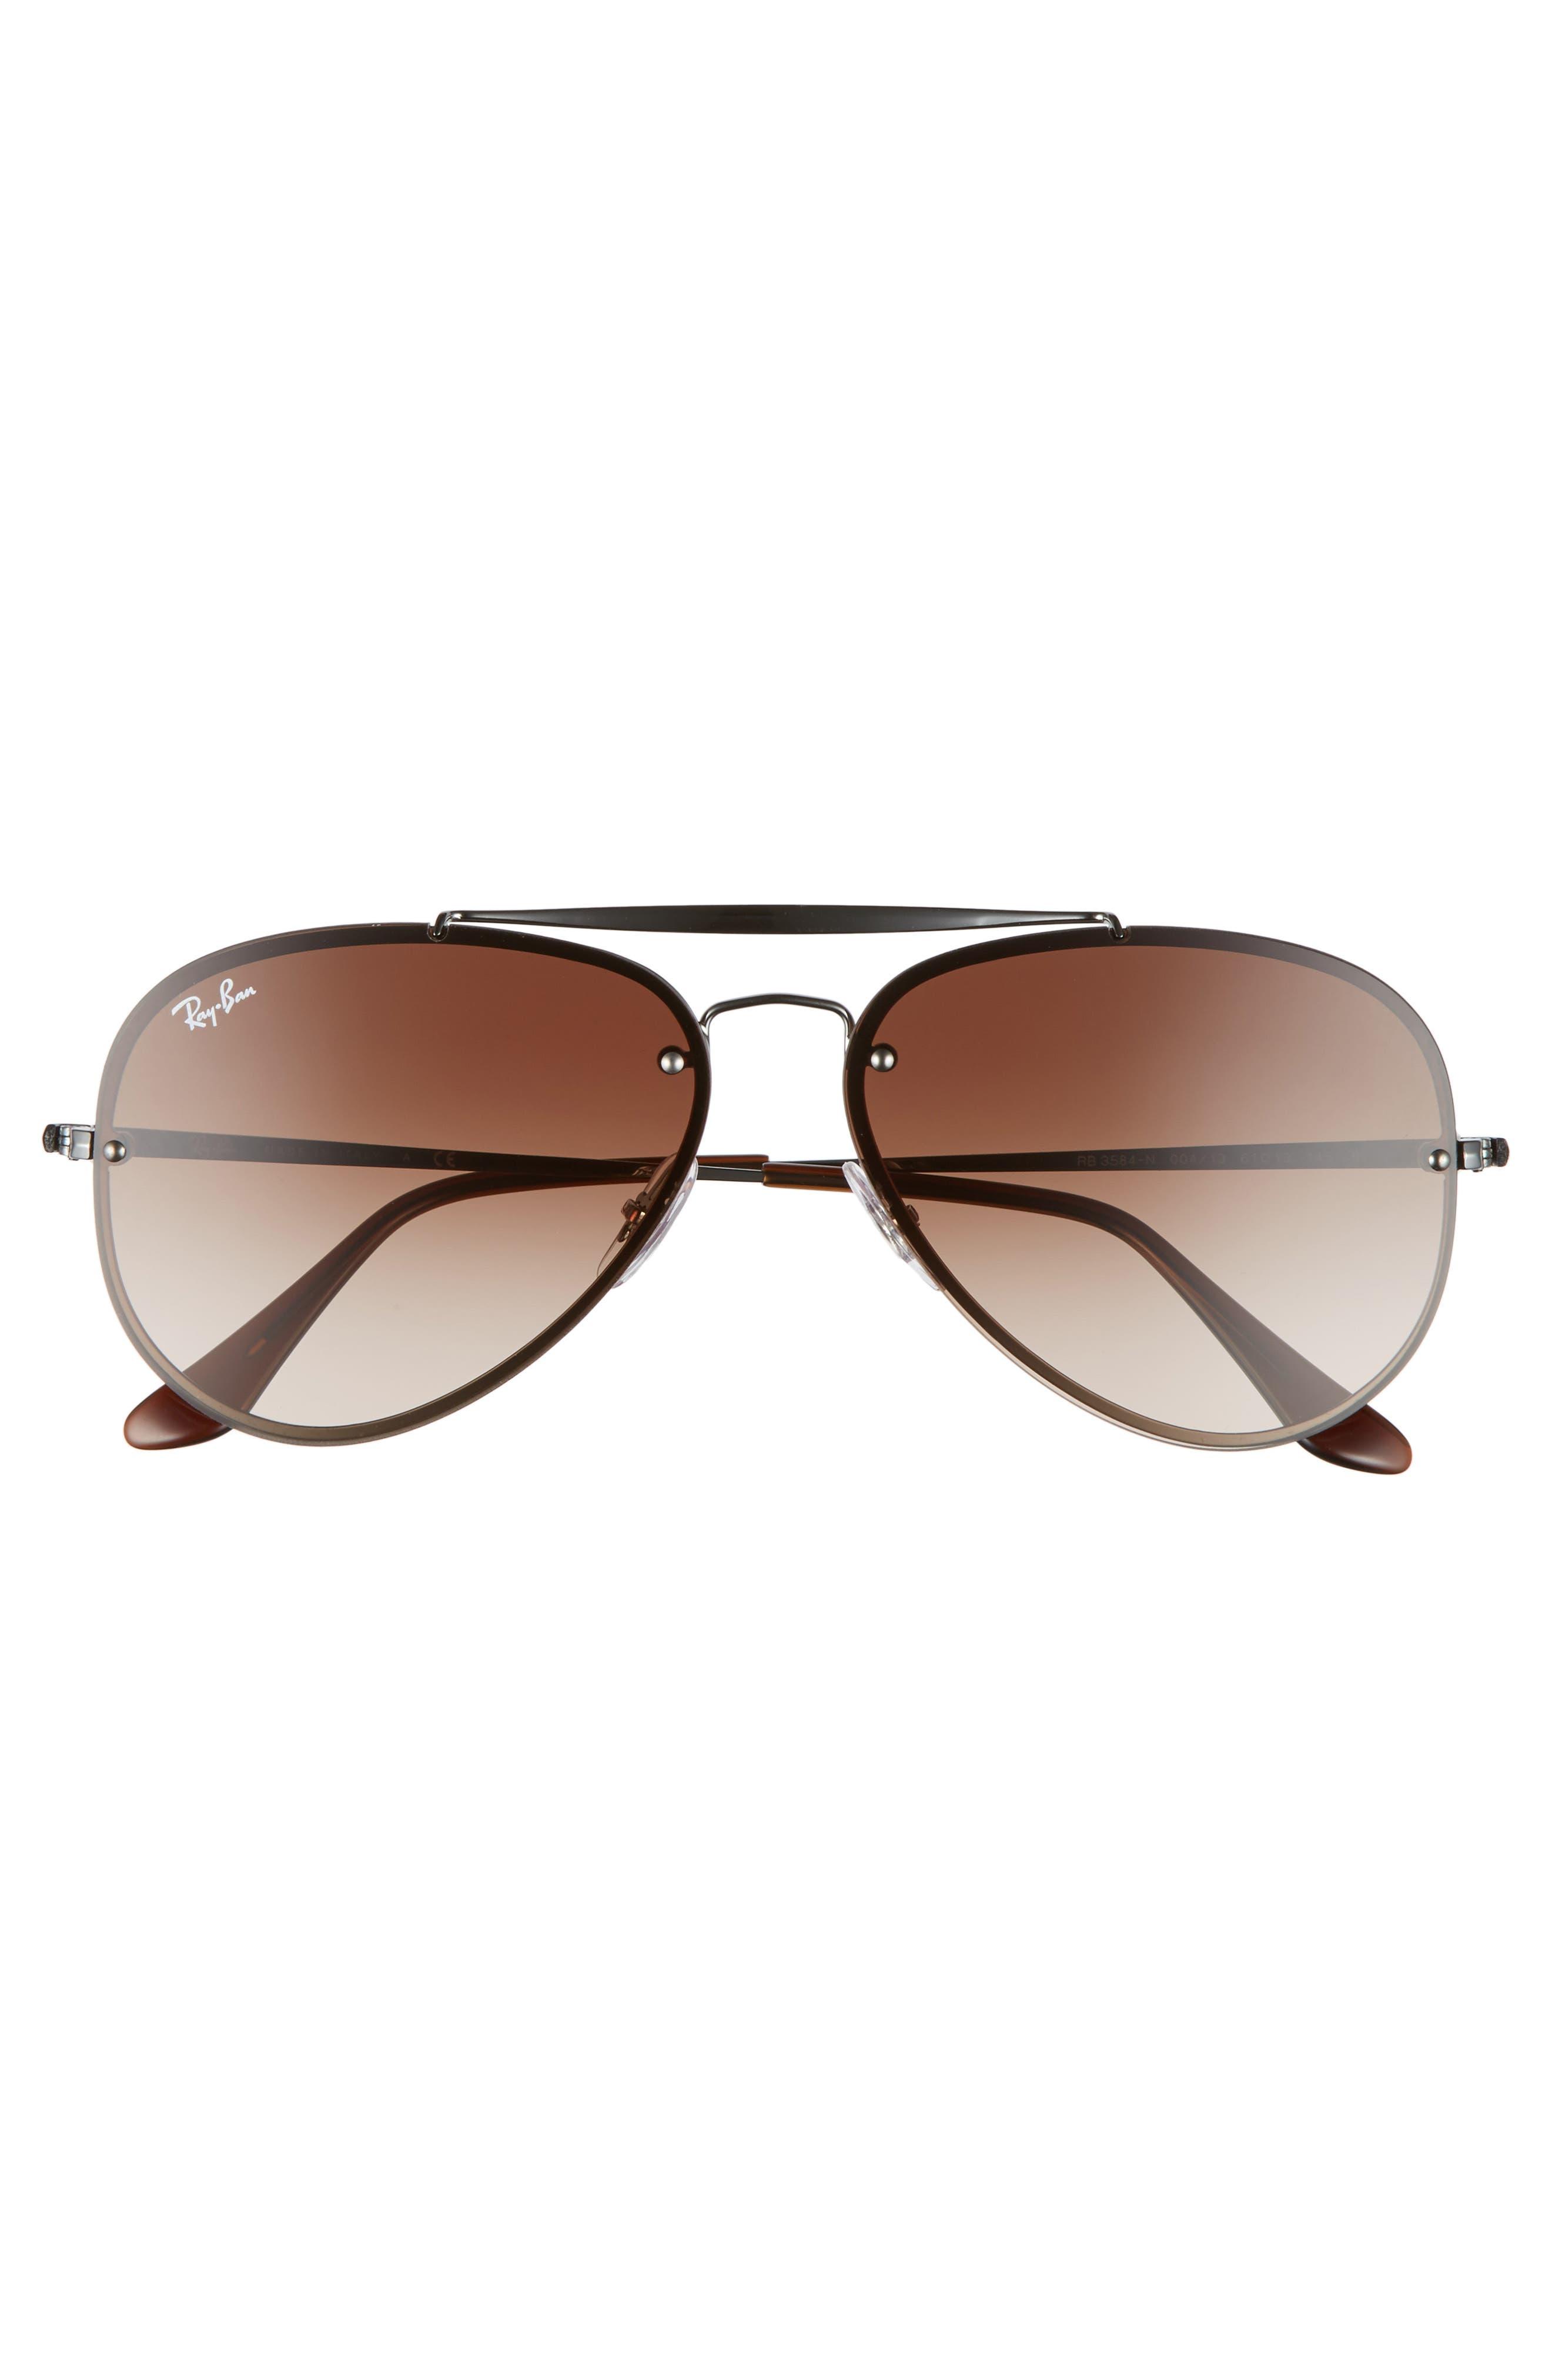 Blaze 61mm Aviator Sunglasses,                             Alternate thumbnail 2, color,                             Gunmetal/ Brown